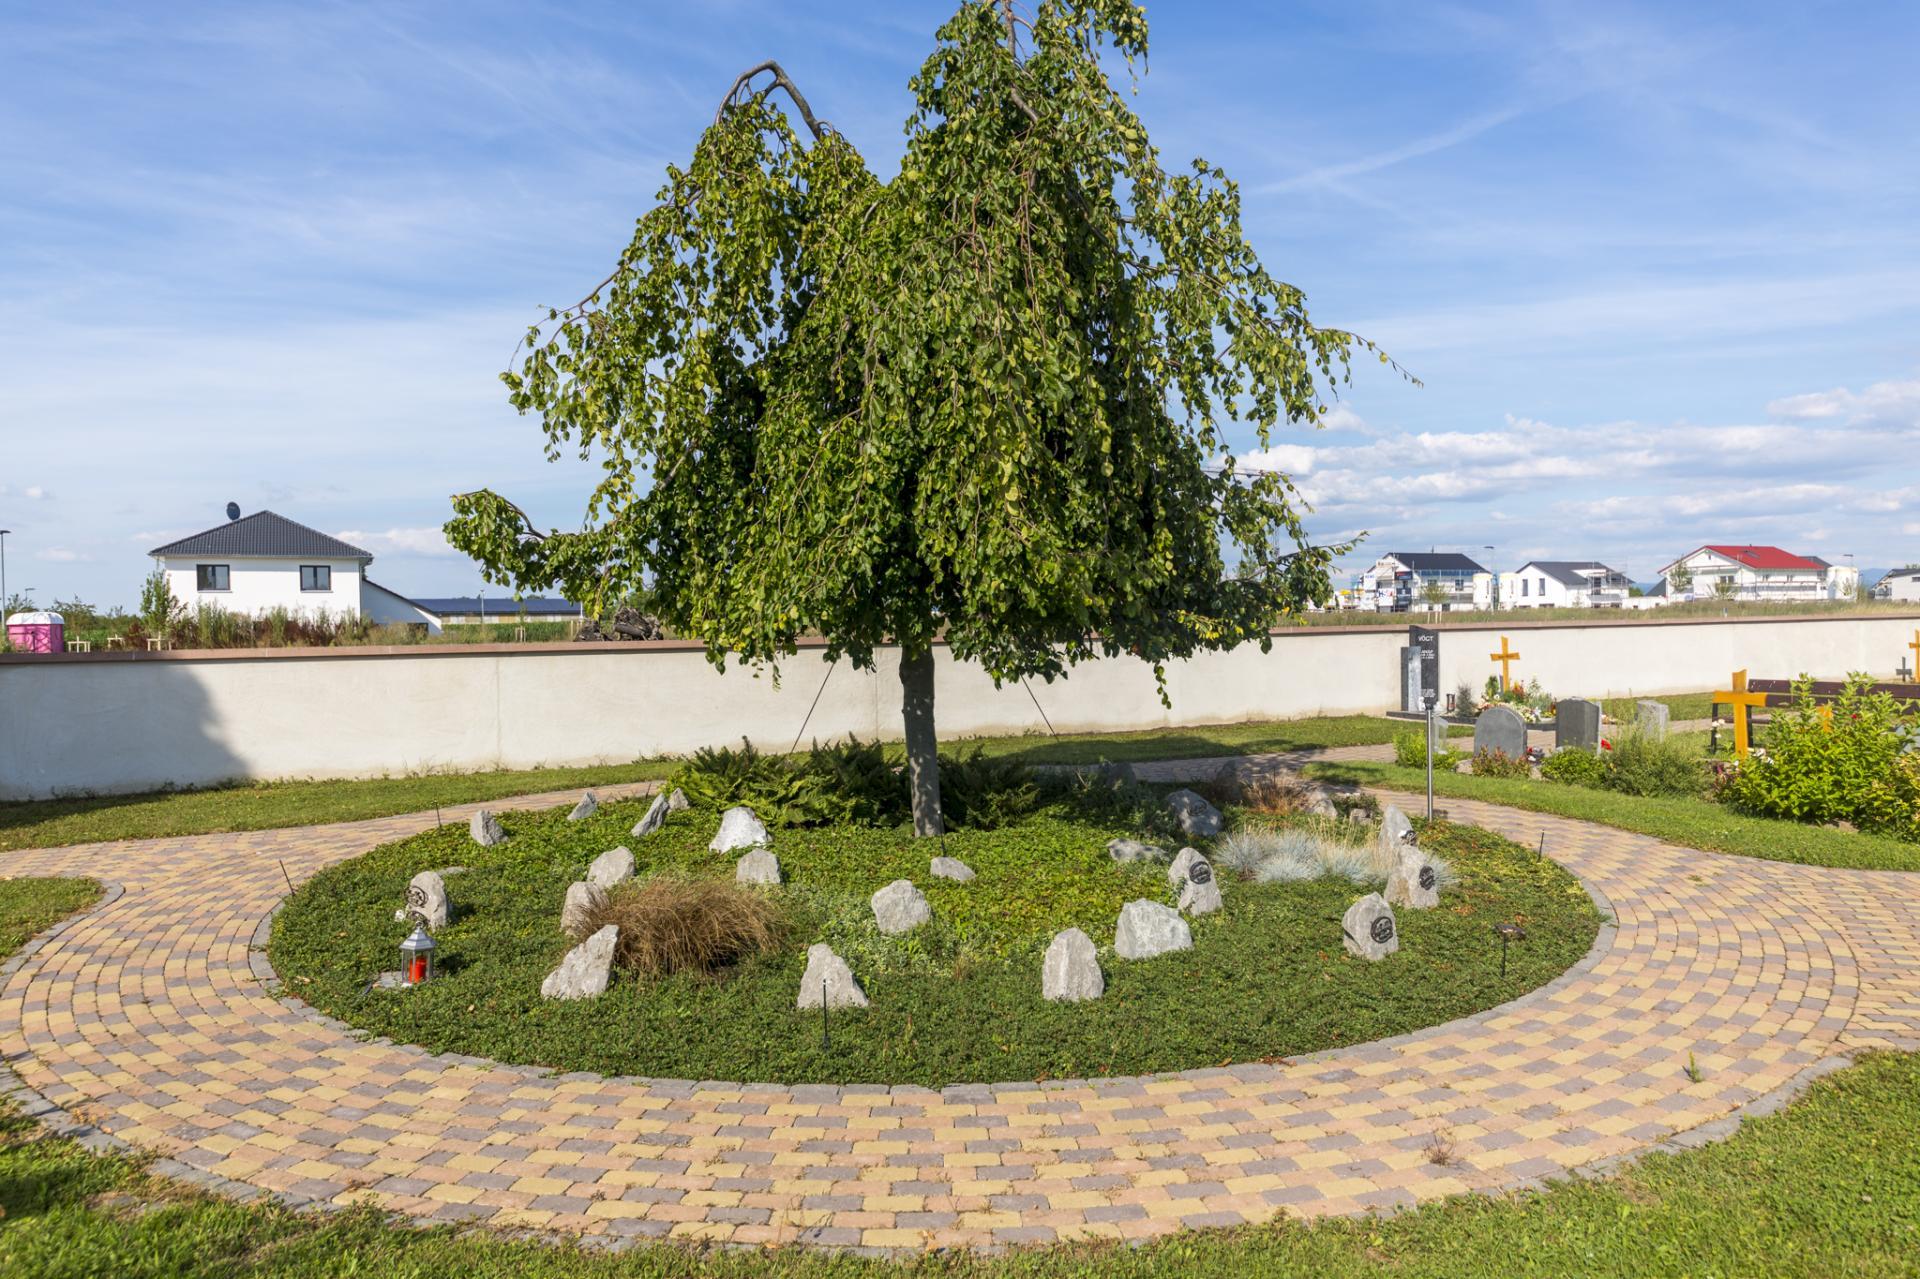 Friedhof - Gärtnergepflegtes Grabfeld